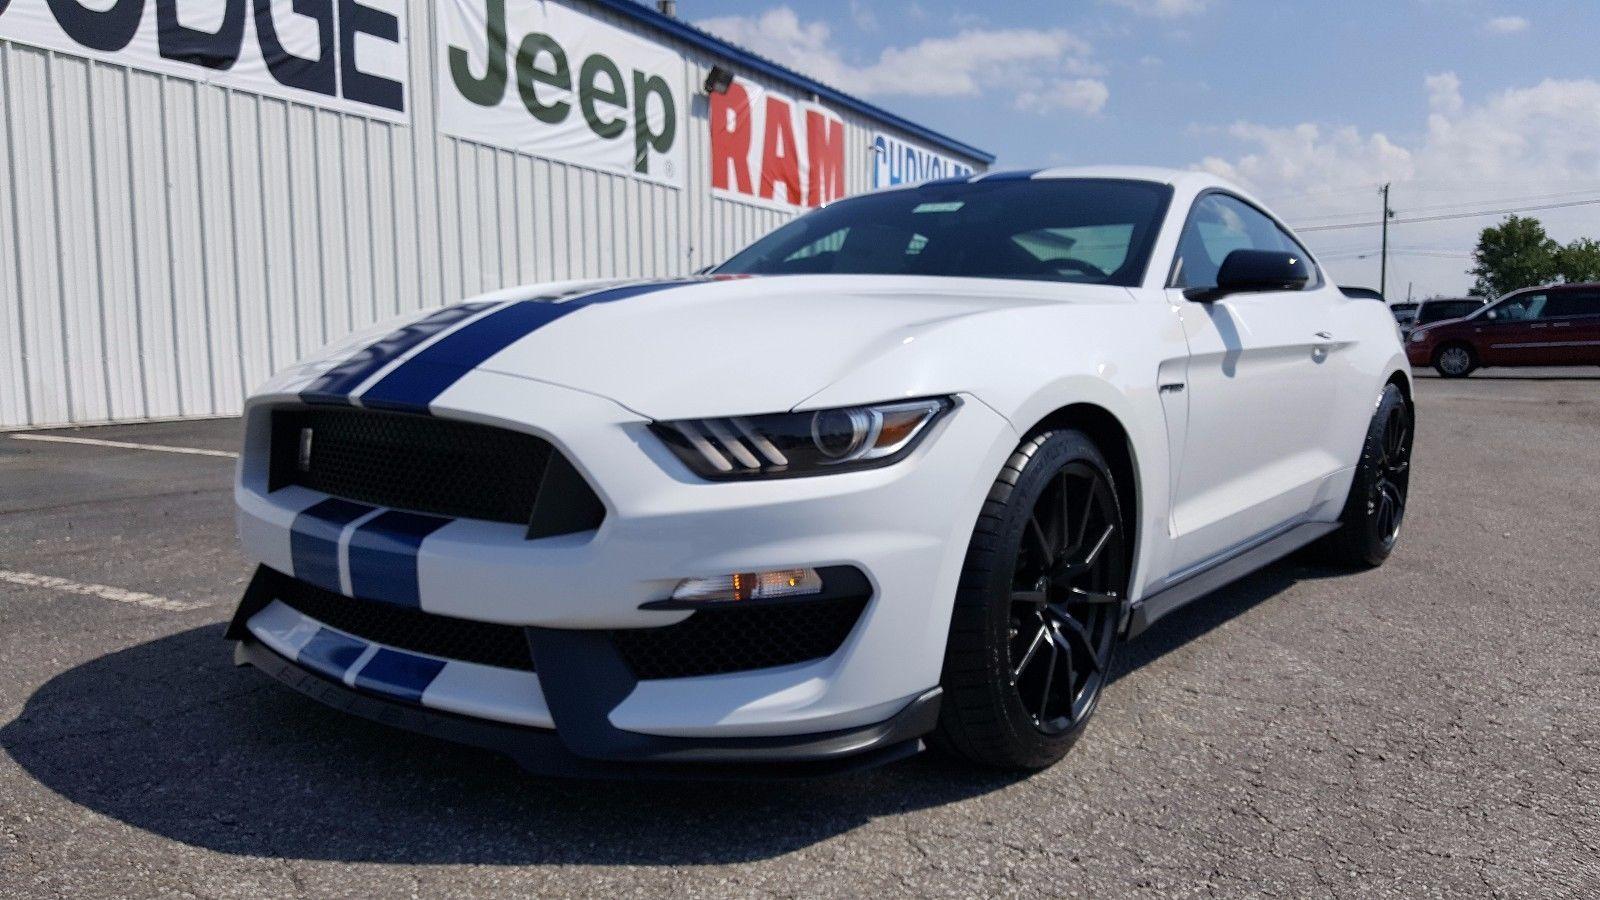 Blue stripe wallpaper ebay - Ebay 2017 Ford Mustang Gt350 New 2017 Mustang Shelby Gt350 White Blue Racing Stripes